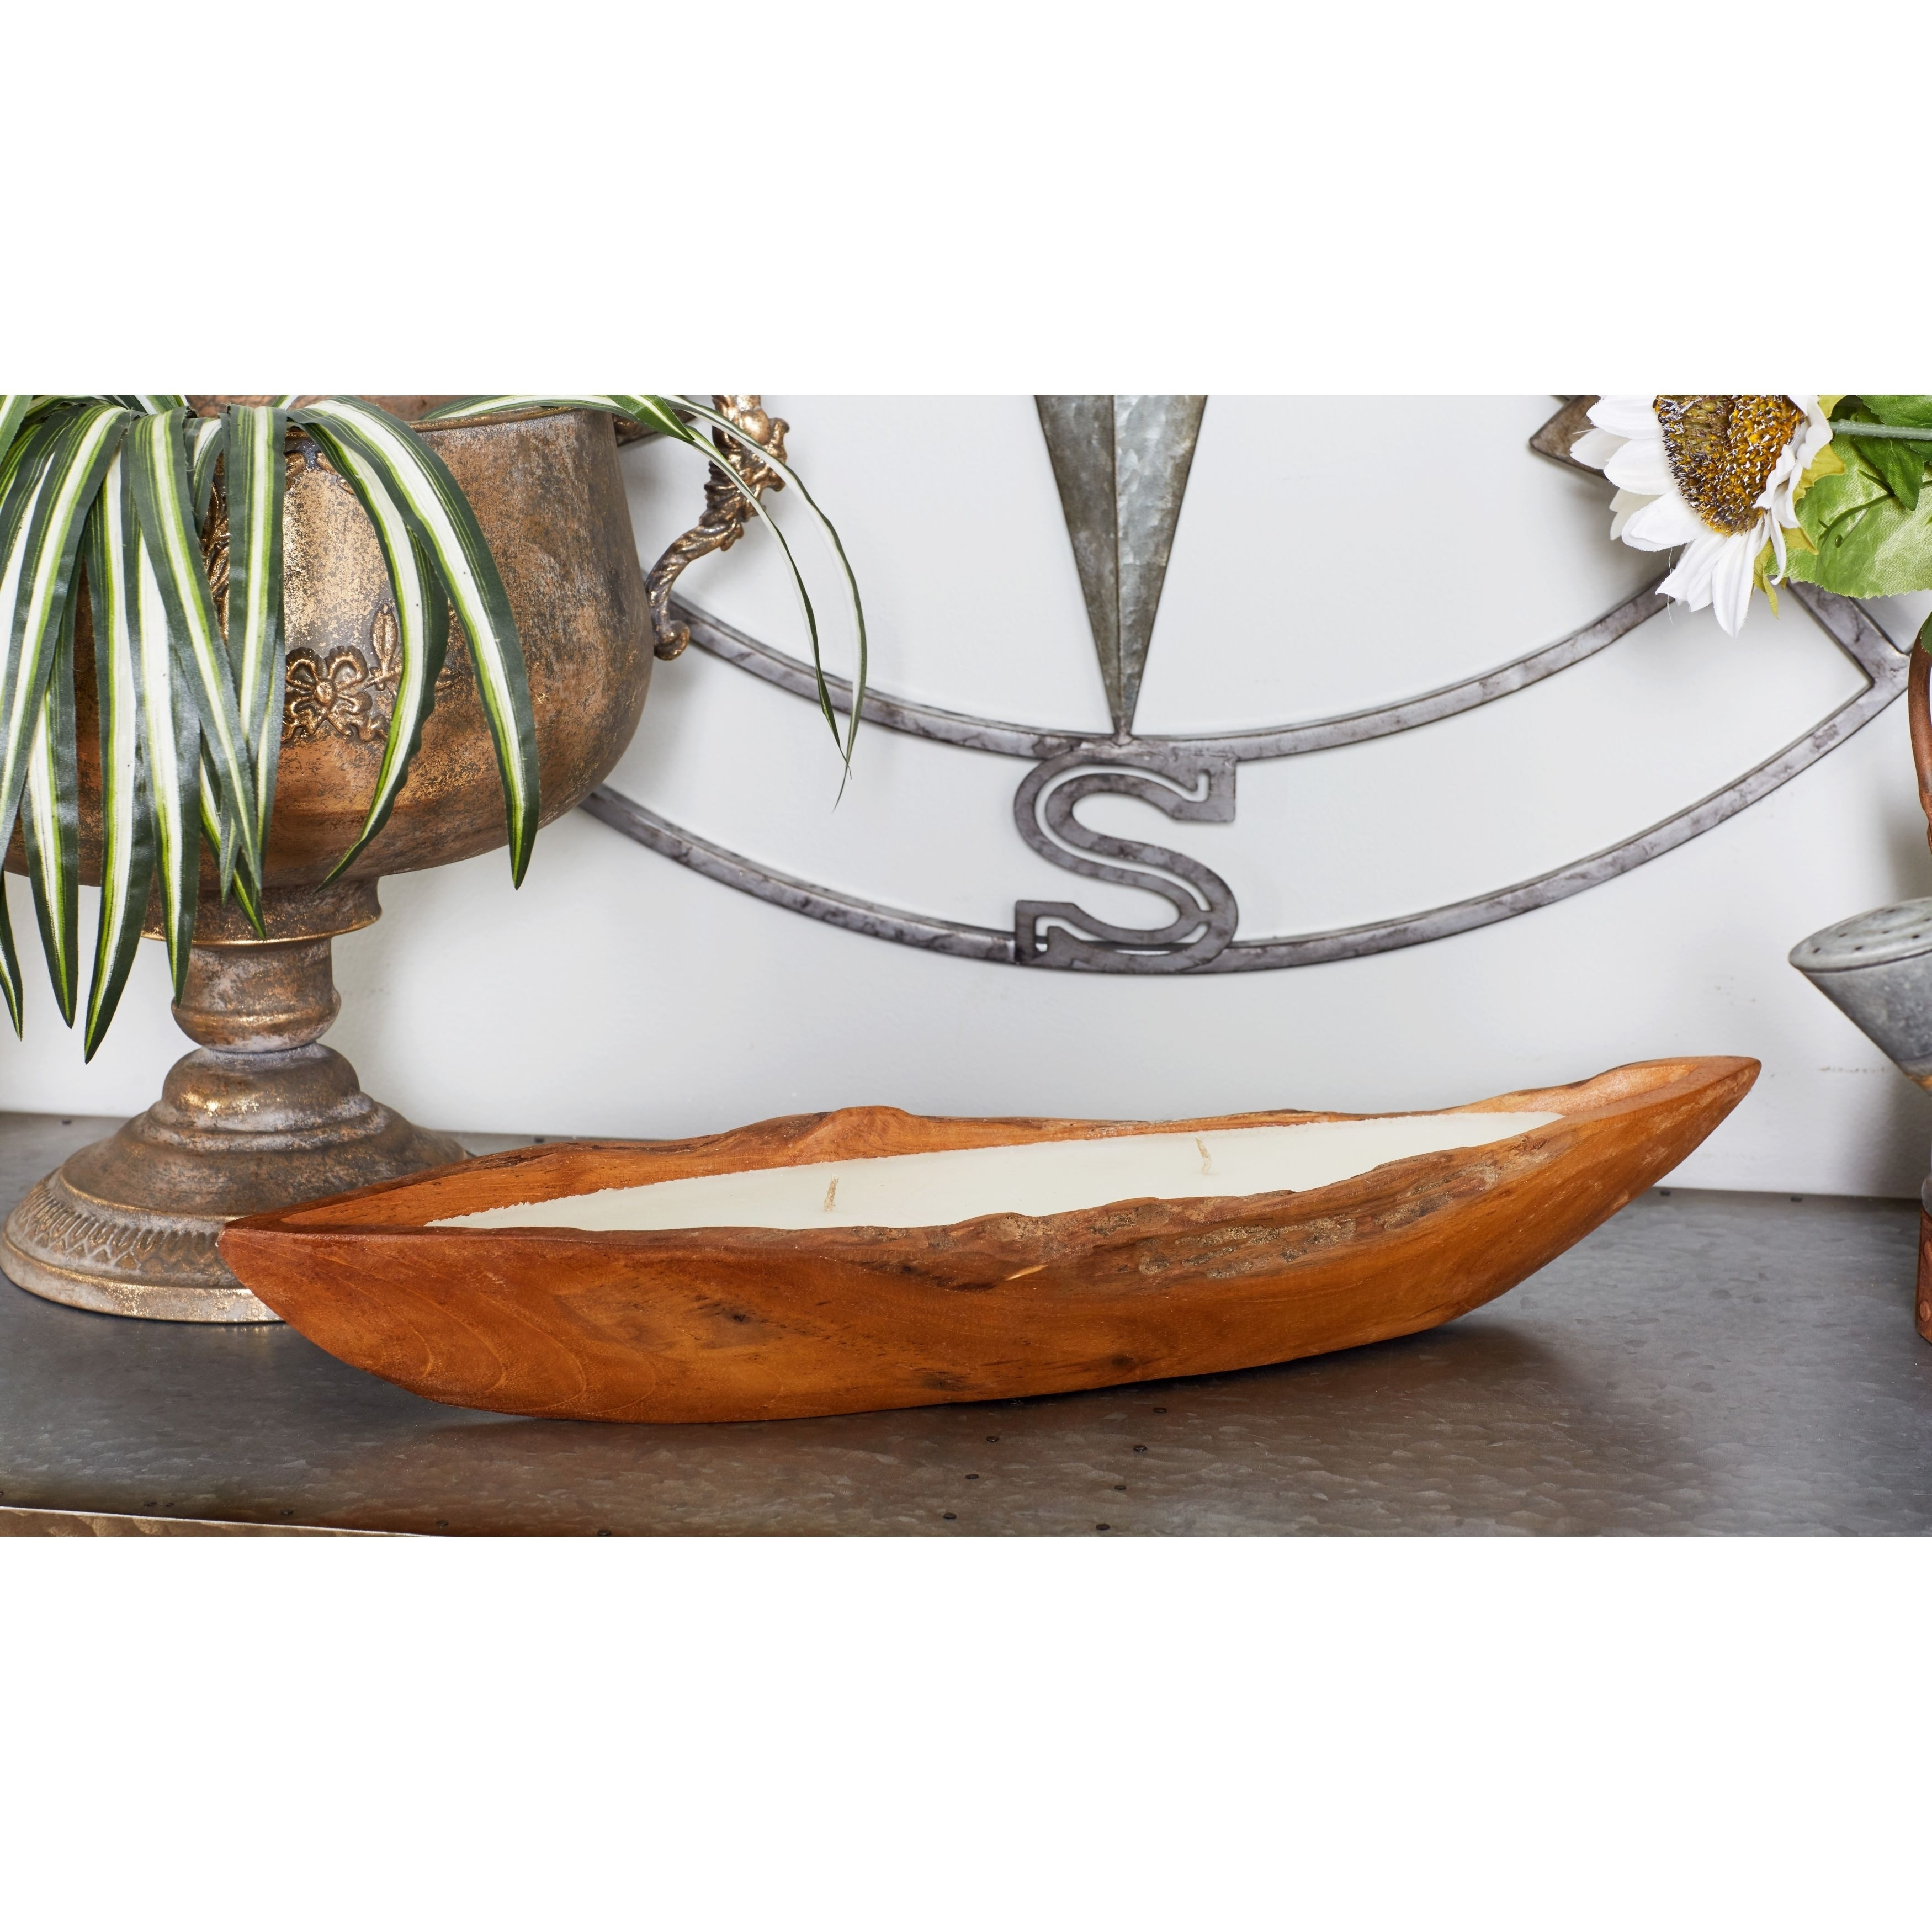 Strick & Bolton Tatum Rustic Teak Wood Candle Boat